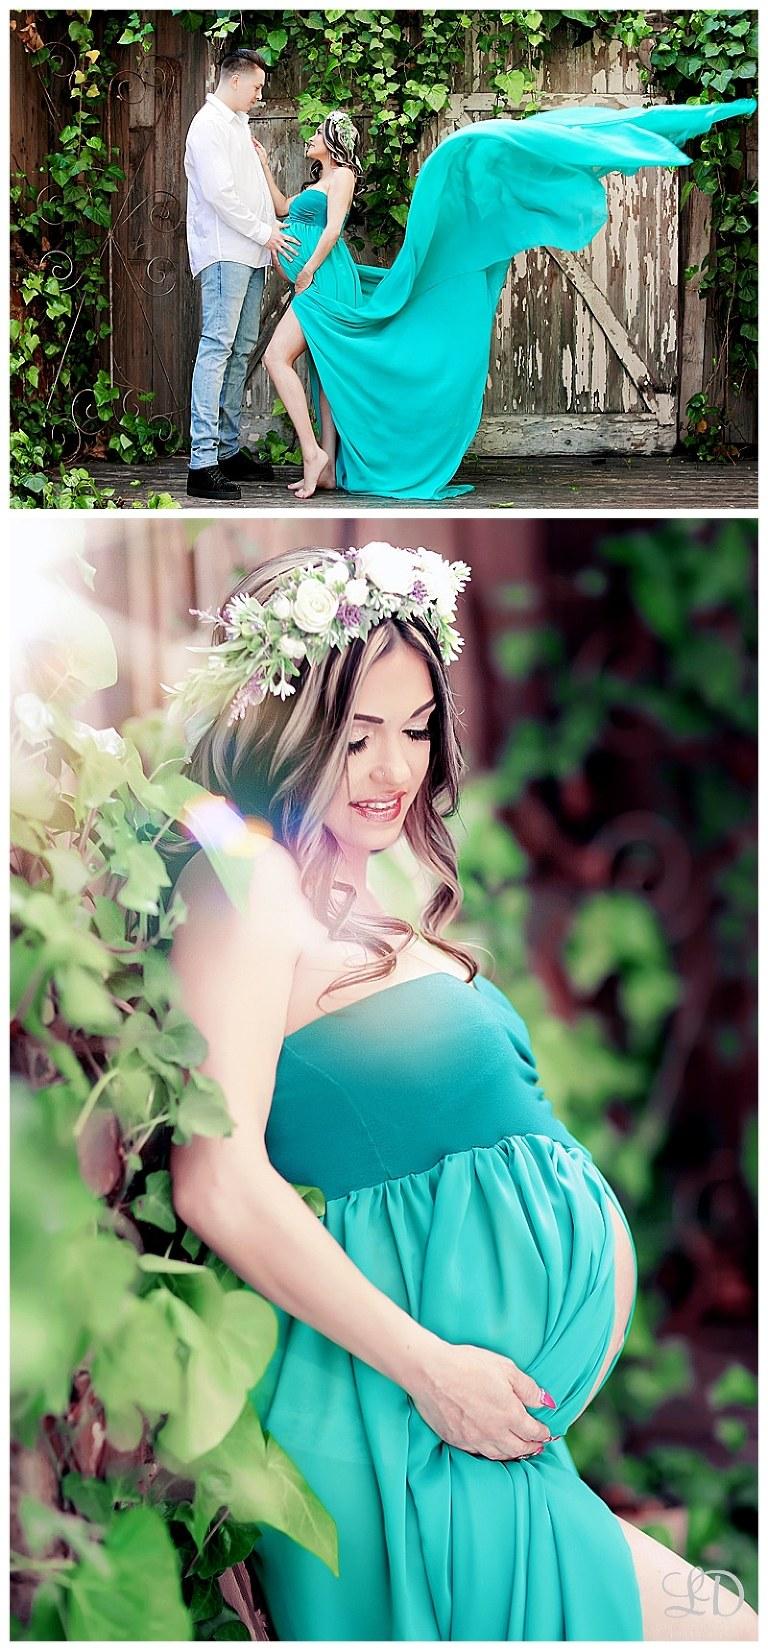 sweet maternity photoshoot-lori dorman photography-maternity boudoir-professional photographer_5846.jpg